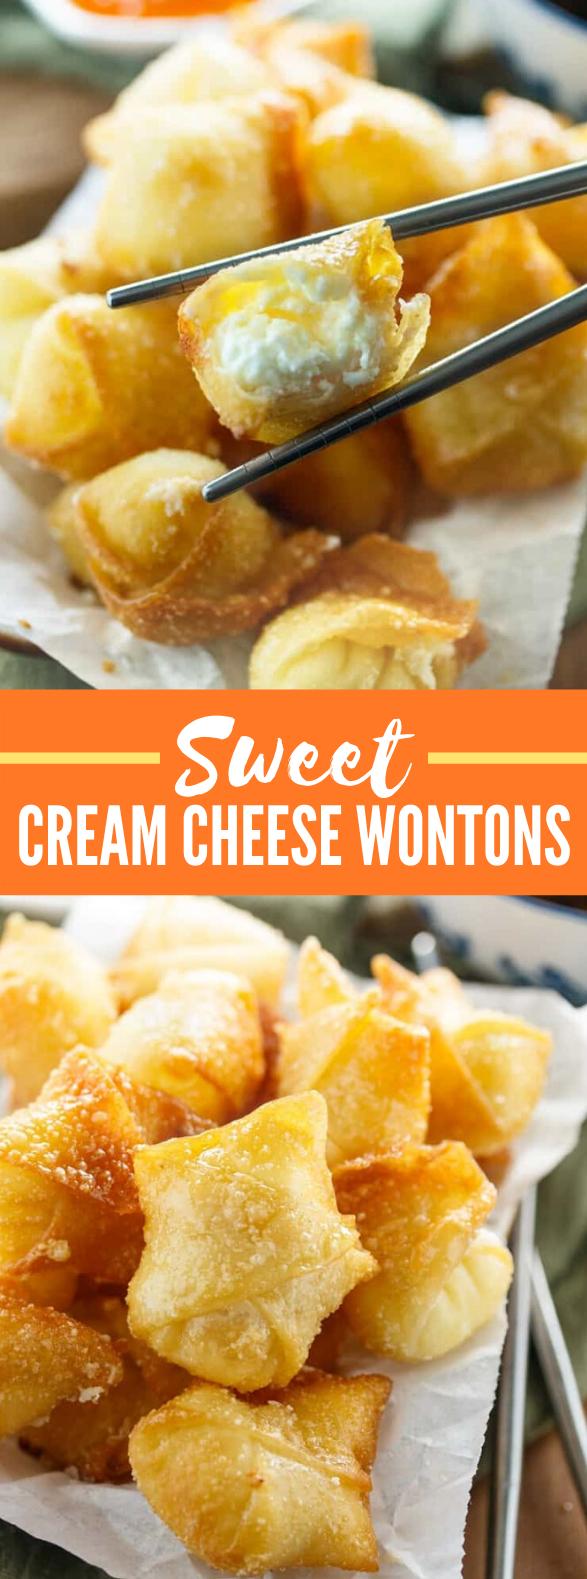 Sweet Cream Cheese Wontons #appetizers #snacks